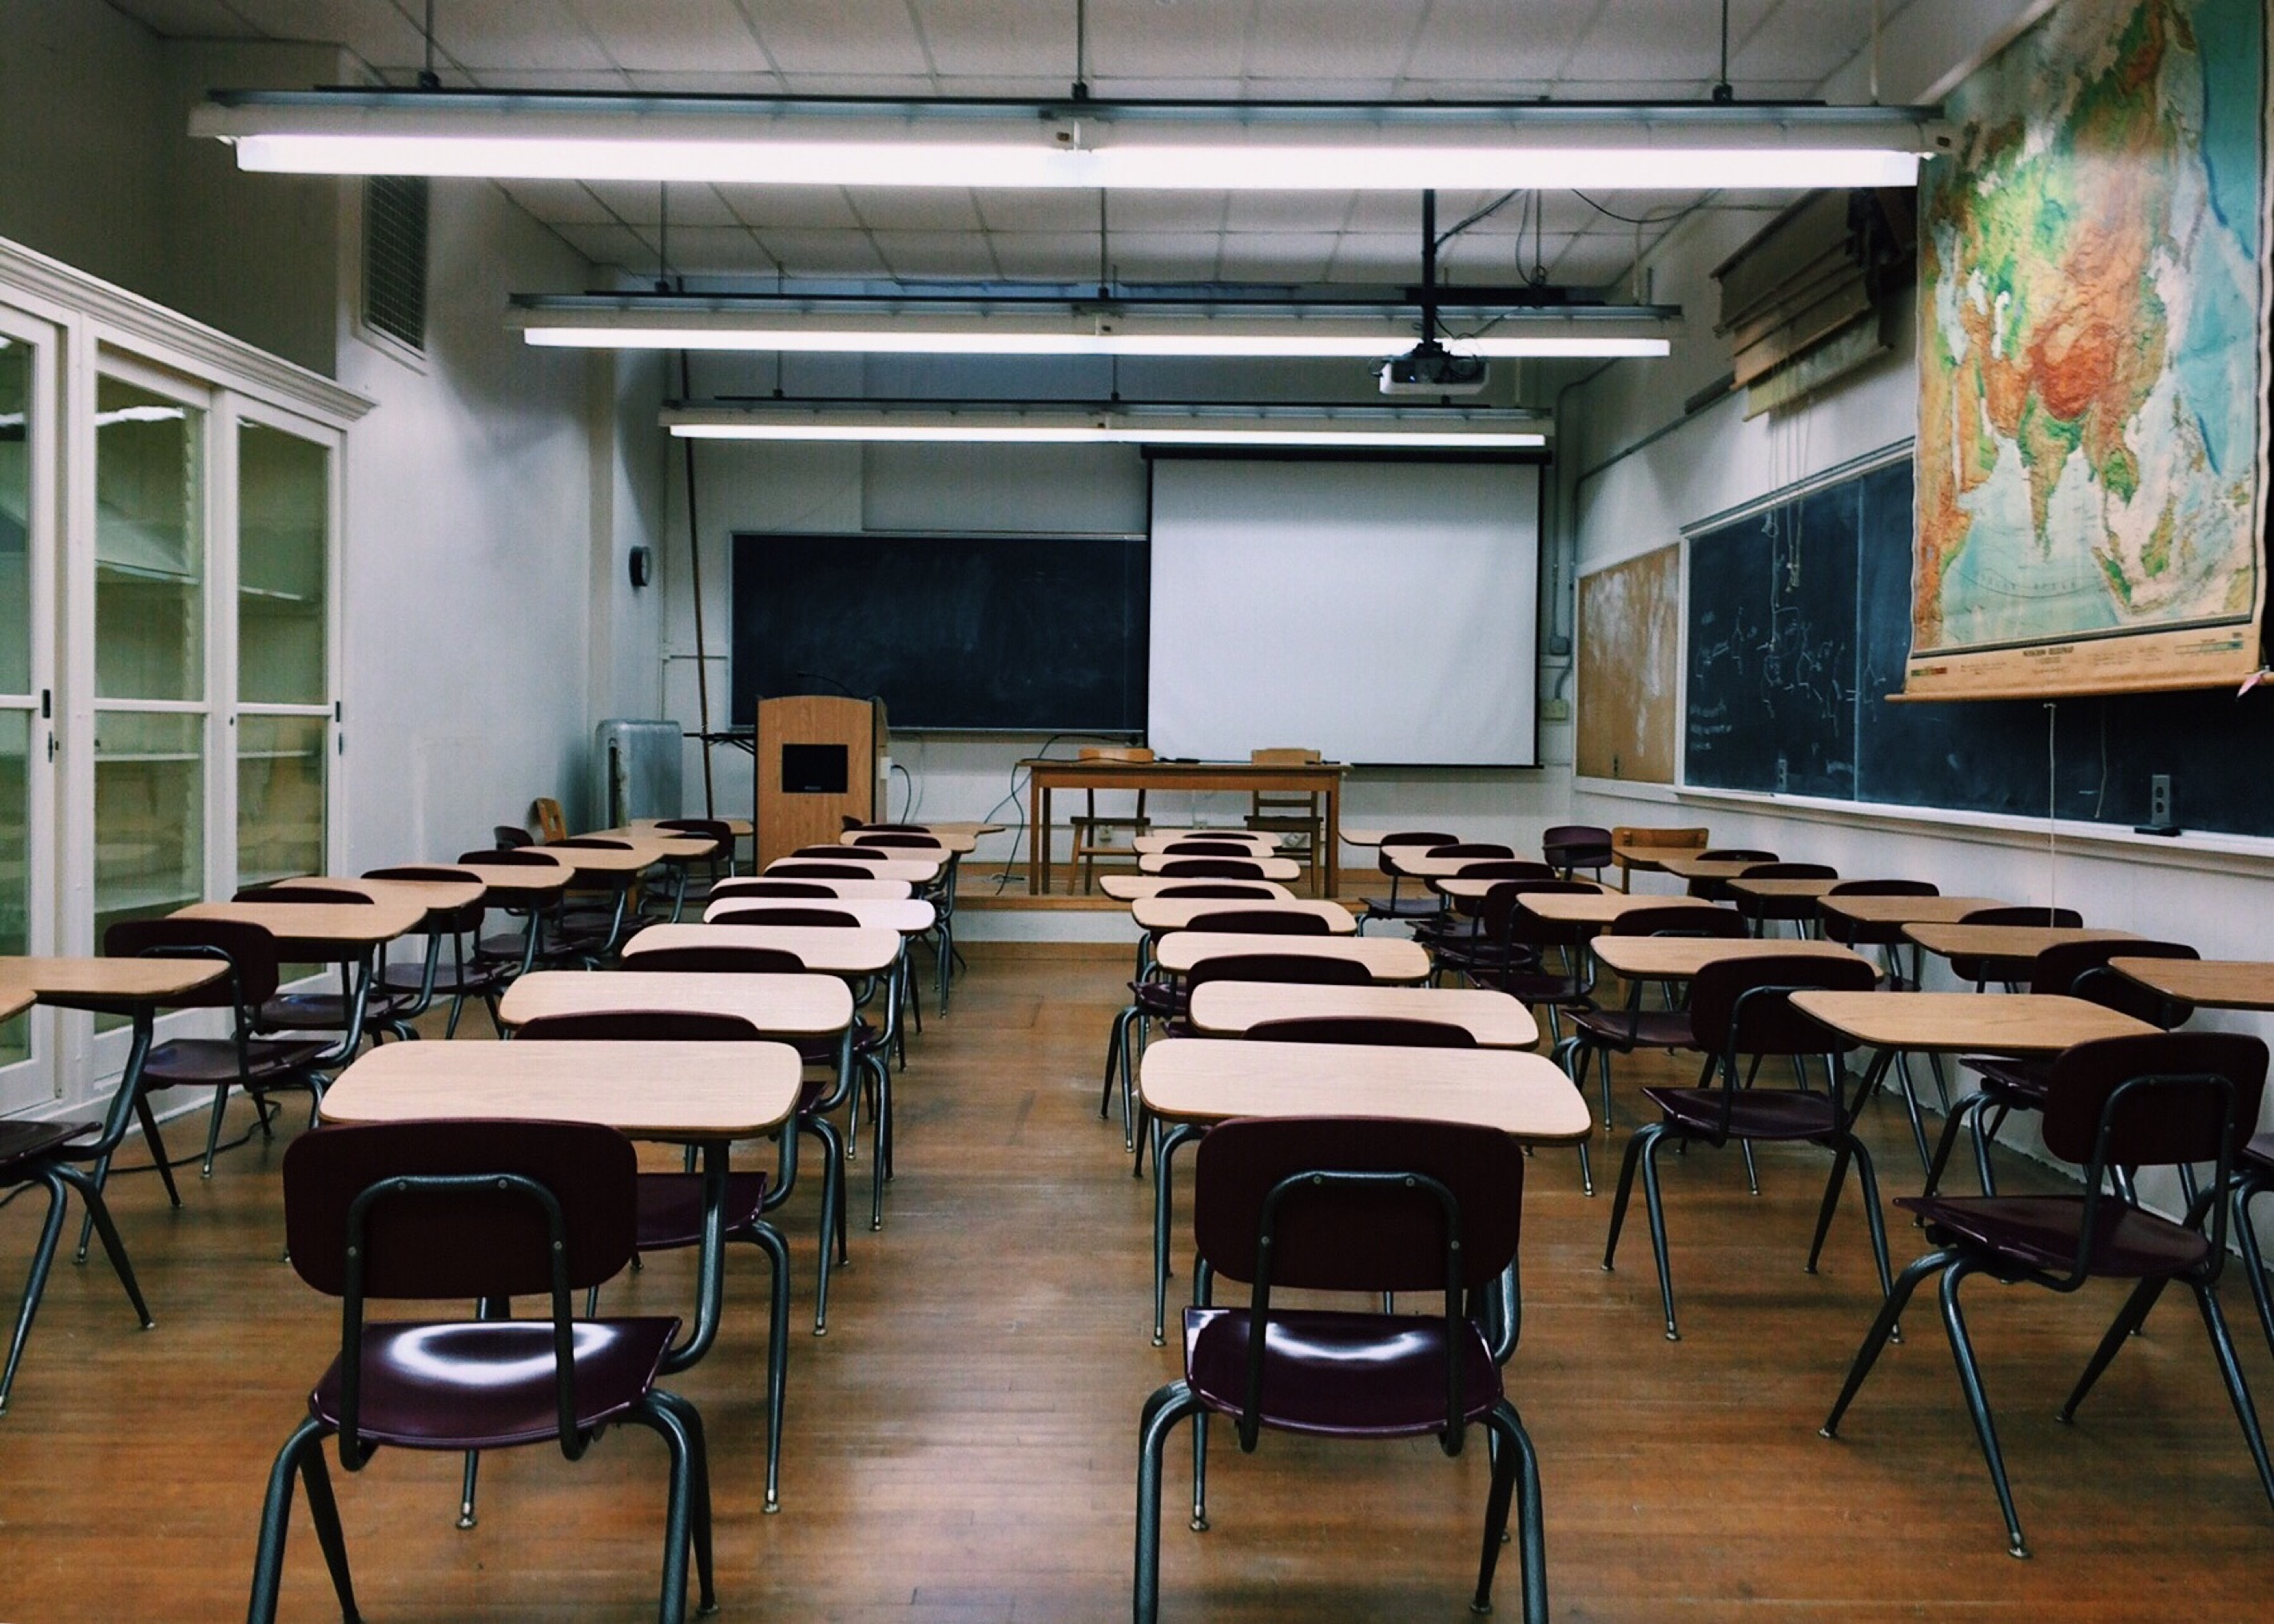 classroom-2093743